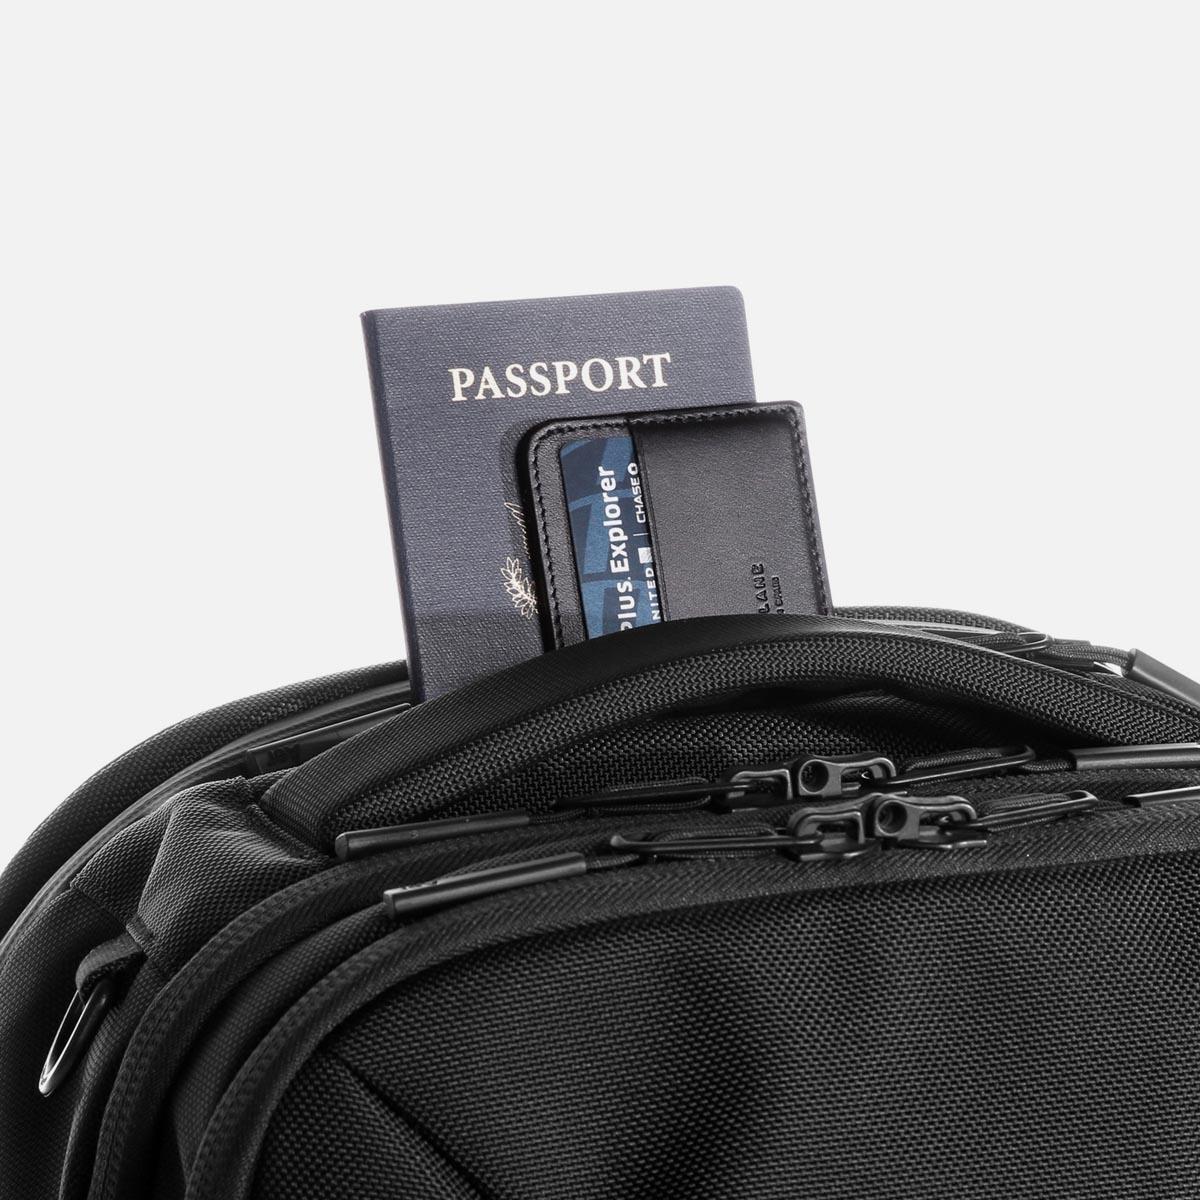 21007_tp2_black_passport.JPG